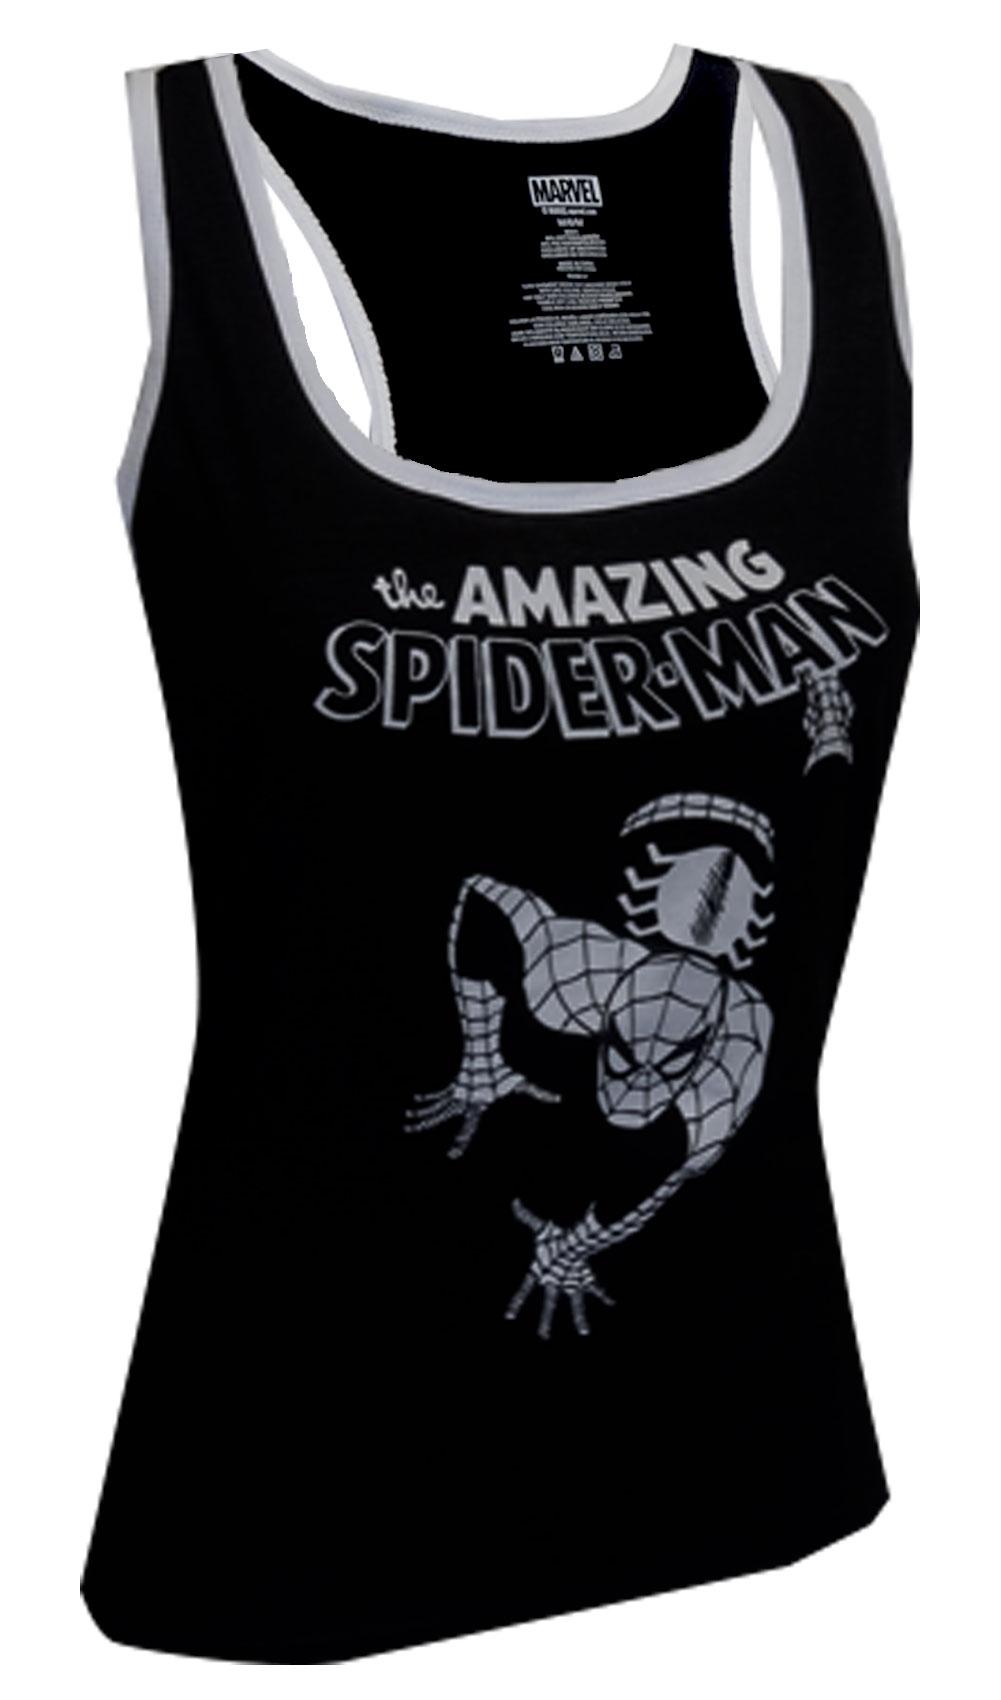 Marvel Comics Amazing Spiderman Racer Back Tank Top for women